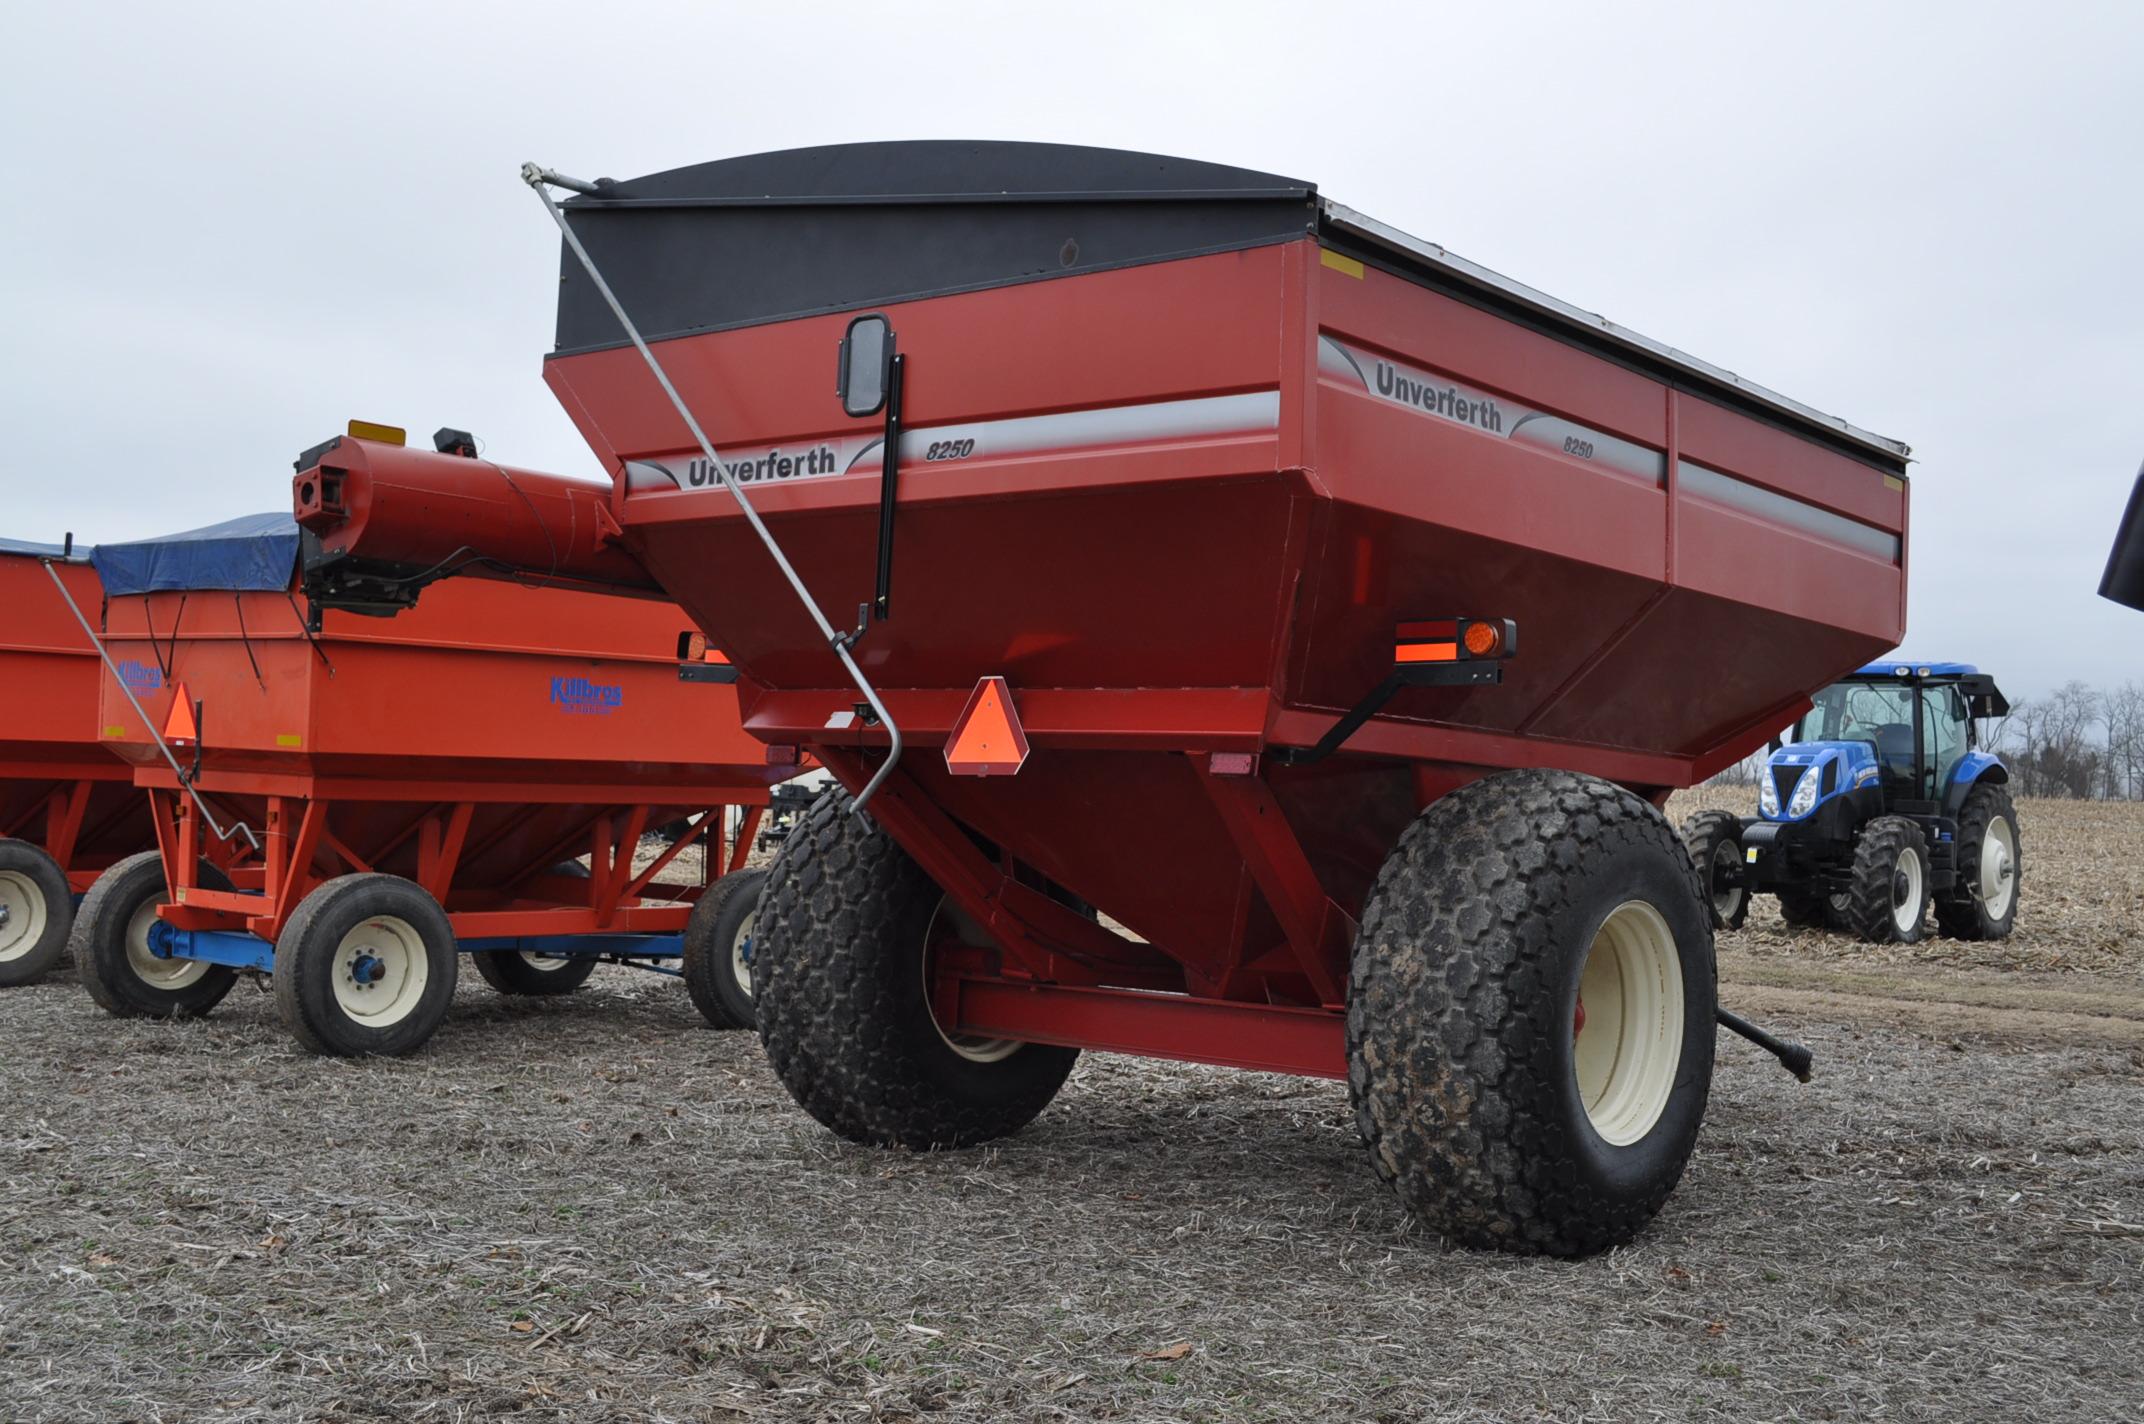 Unverferth 8250 grain cart, corner auger, 30.5L-32 diamond tread tires, lights, roll tarp, hyd - Image 3 of 11